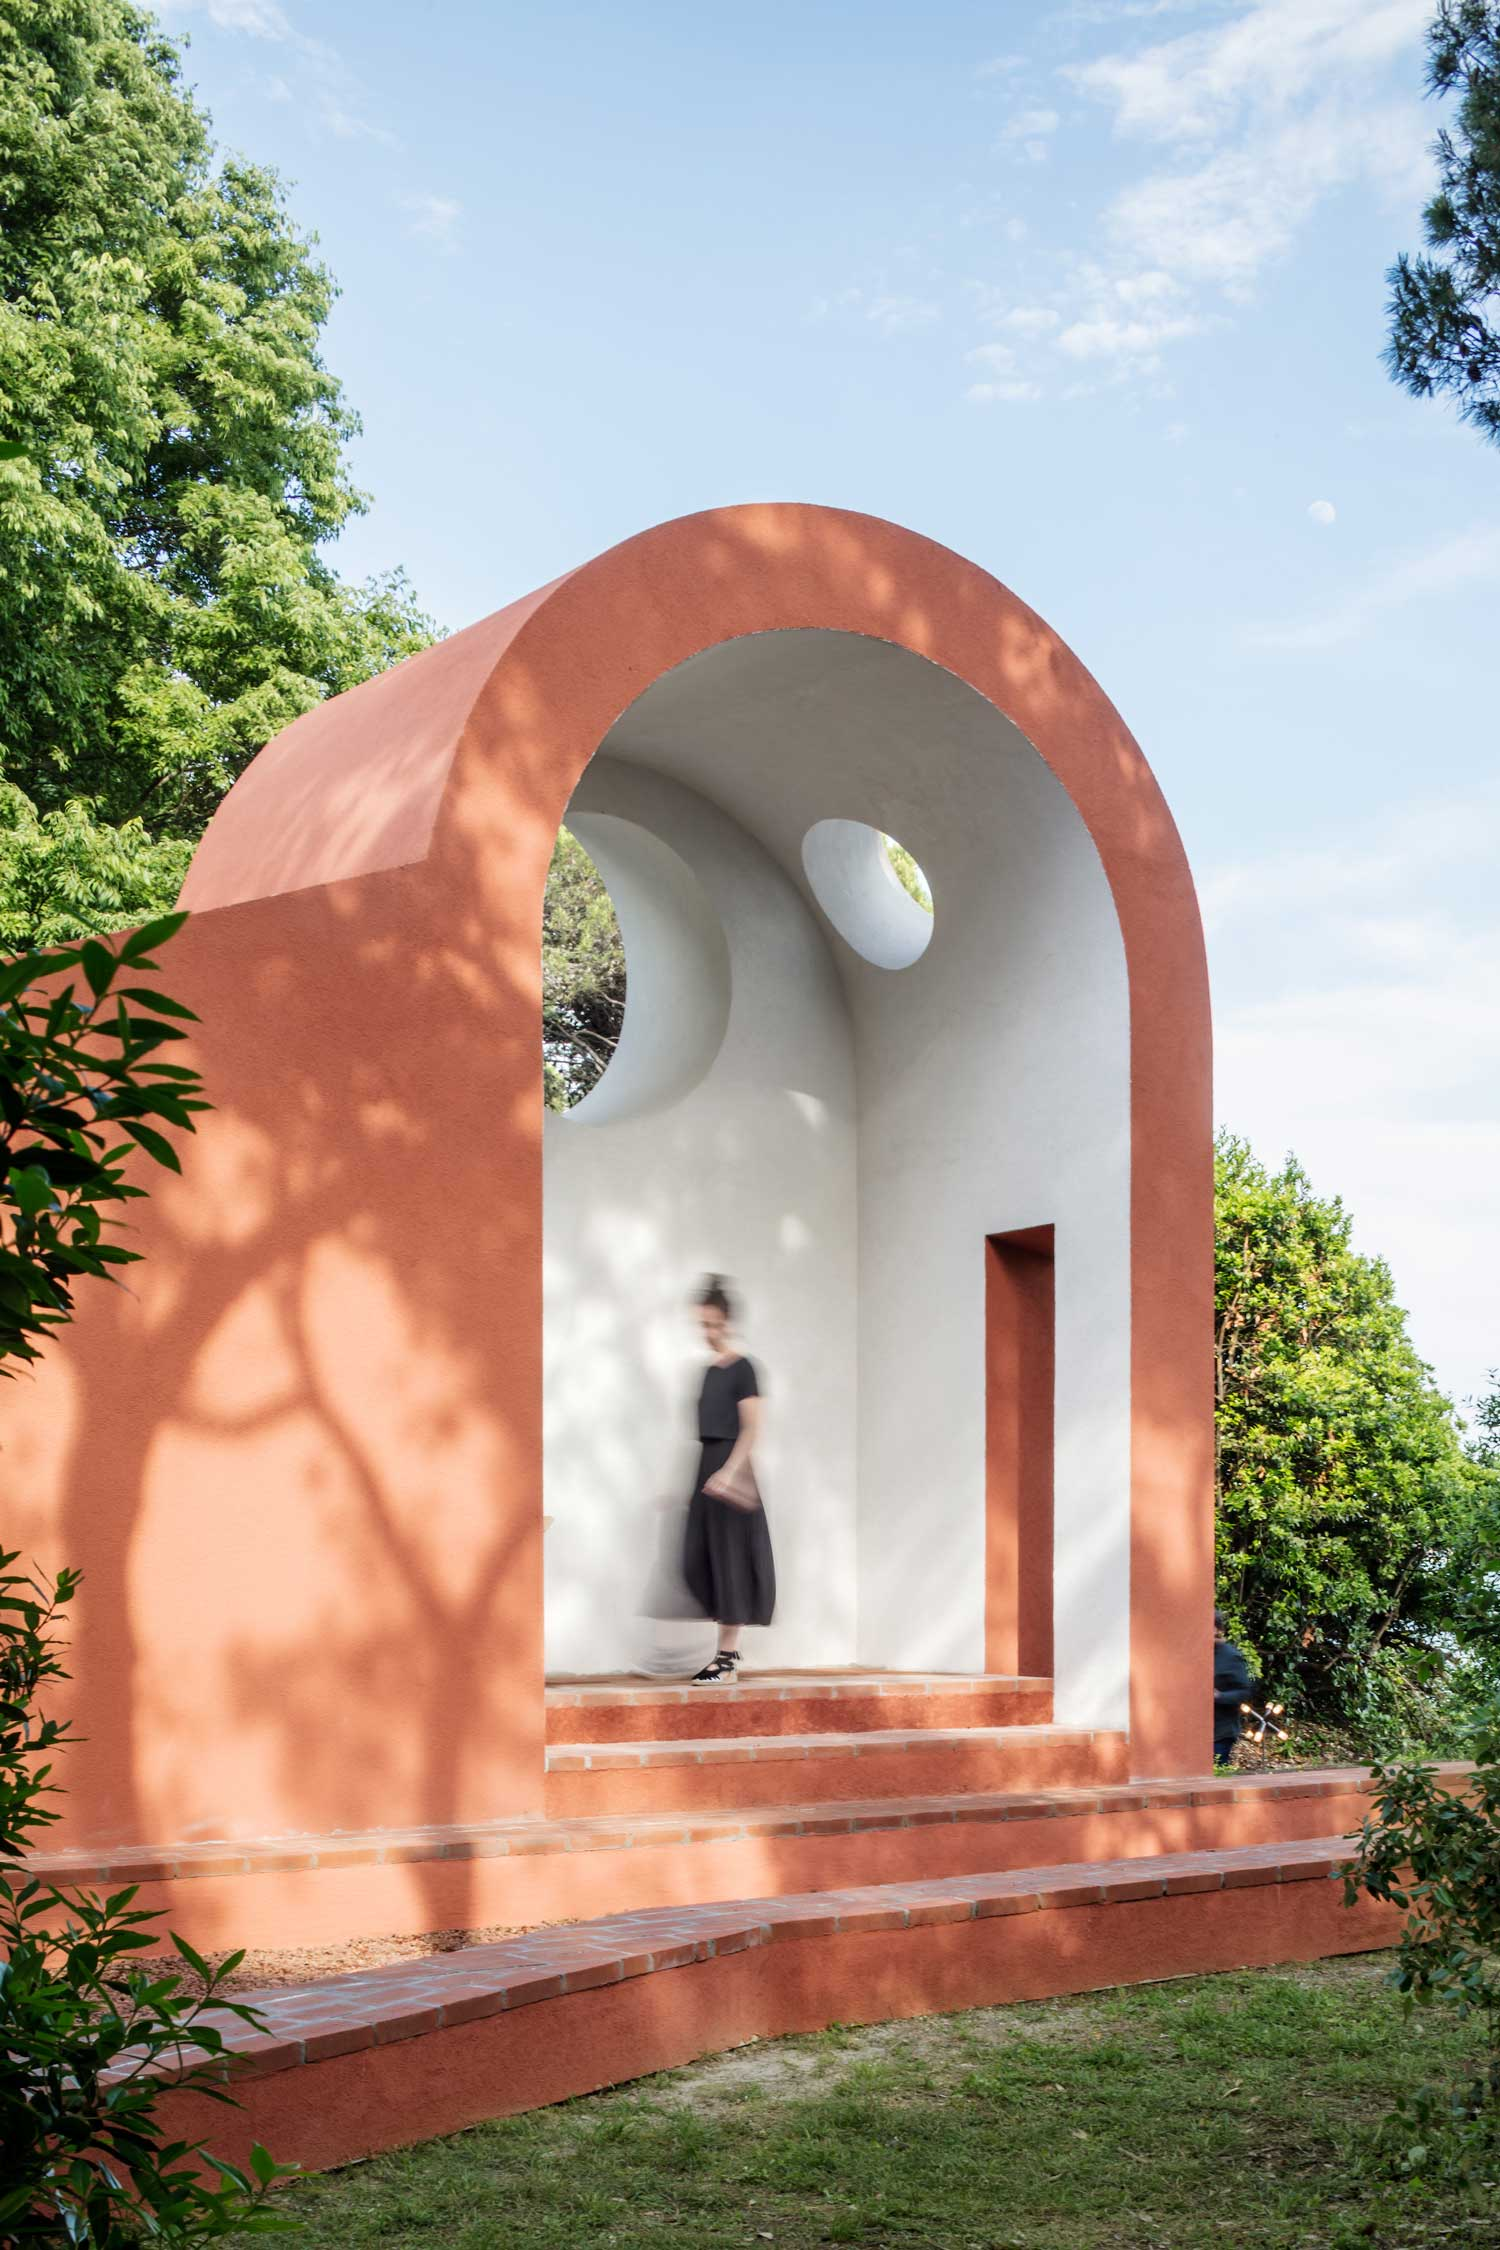 Flores & Prats, Padiglione Vaticano Chapel in a Venice Forest, Venice Architecture Biennale 2018 | Yellowtrace